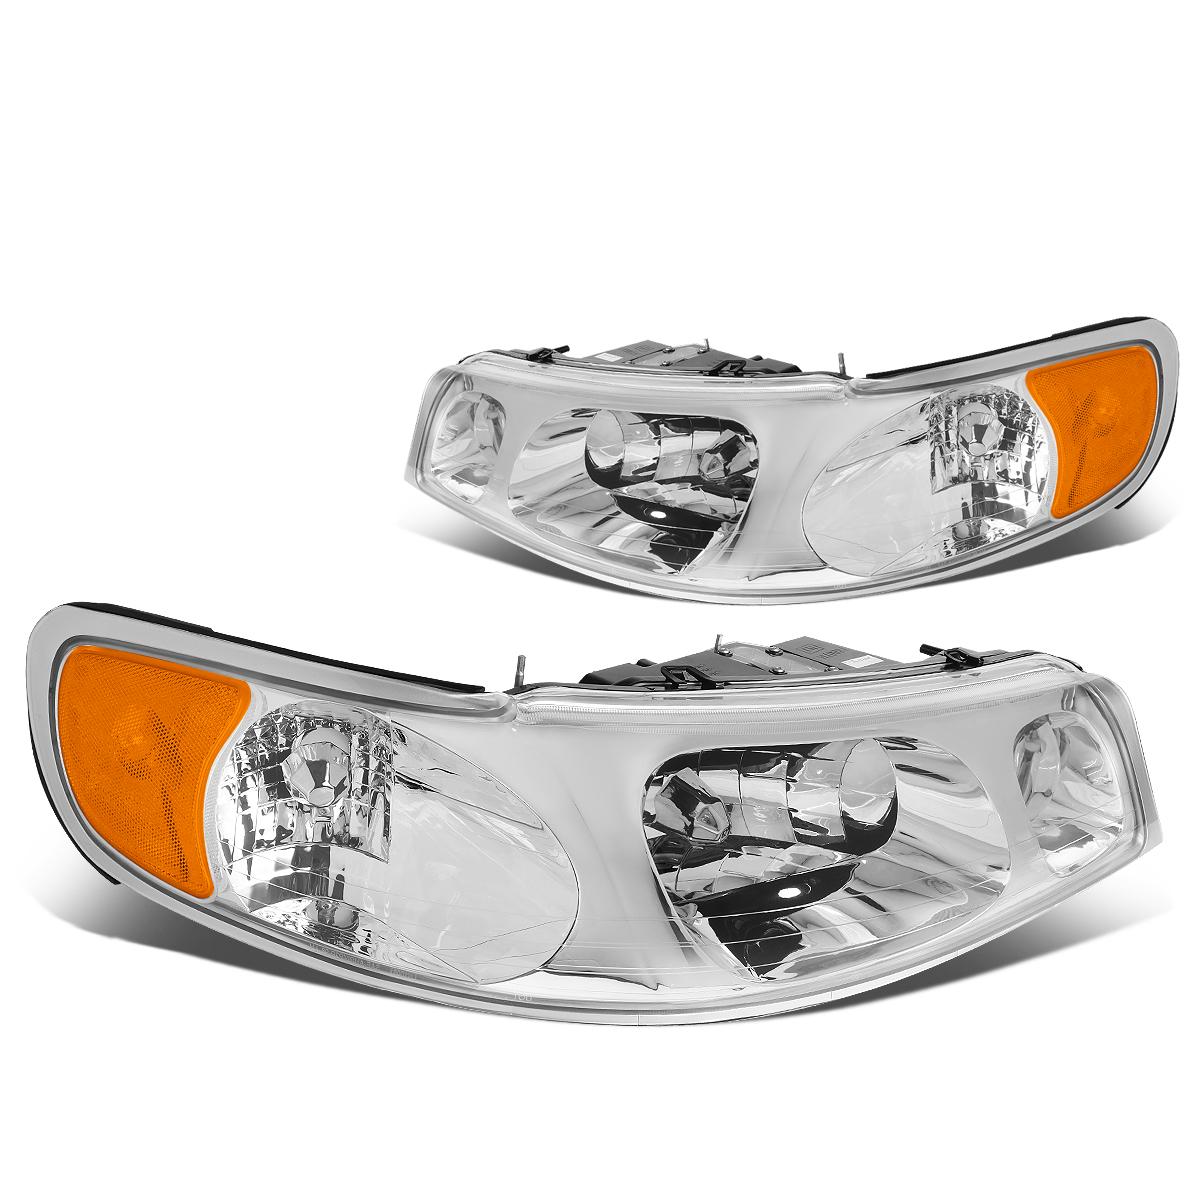 For 1998 To 2002 Lincoln Town Car Headlight Chrome Housing Amber Corner Headlamp 99 00 01 Left